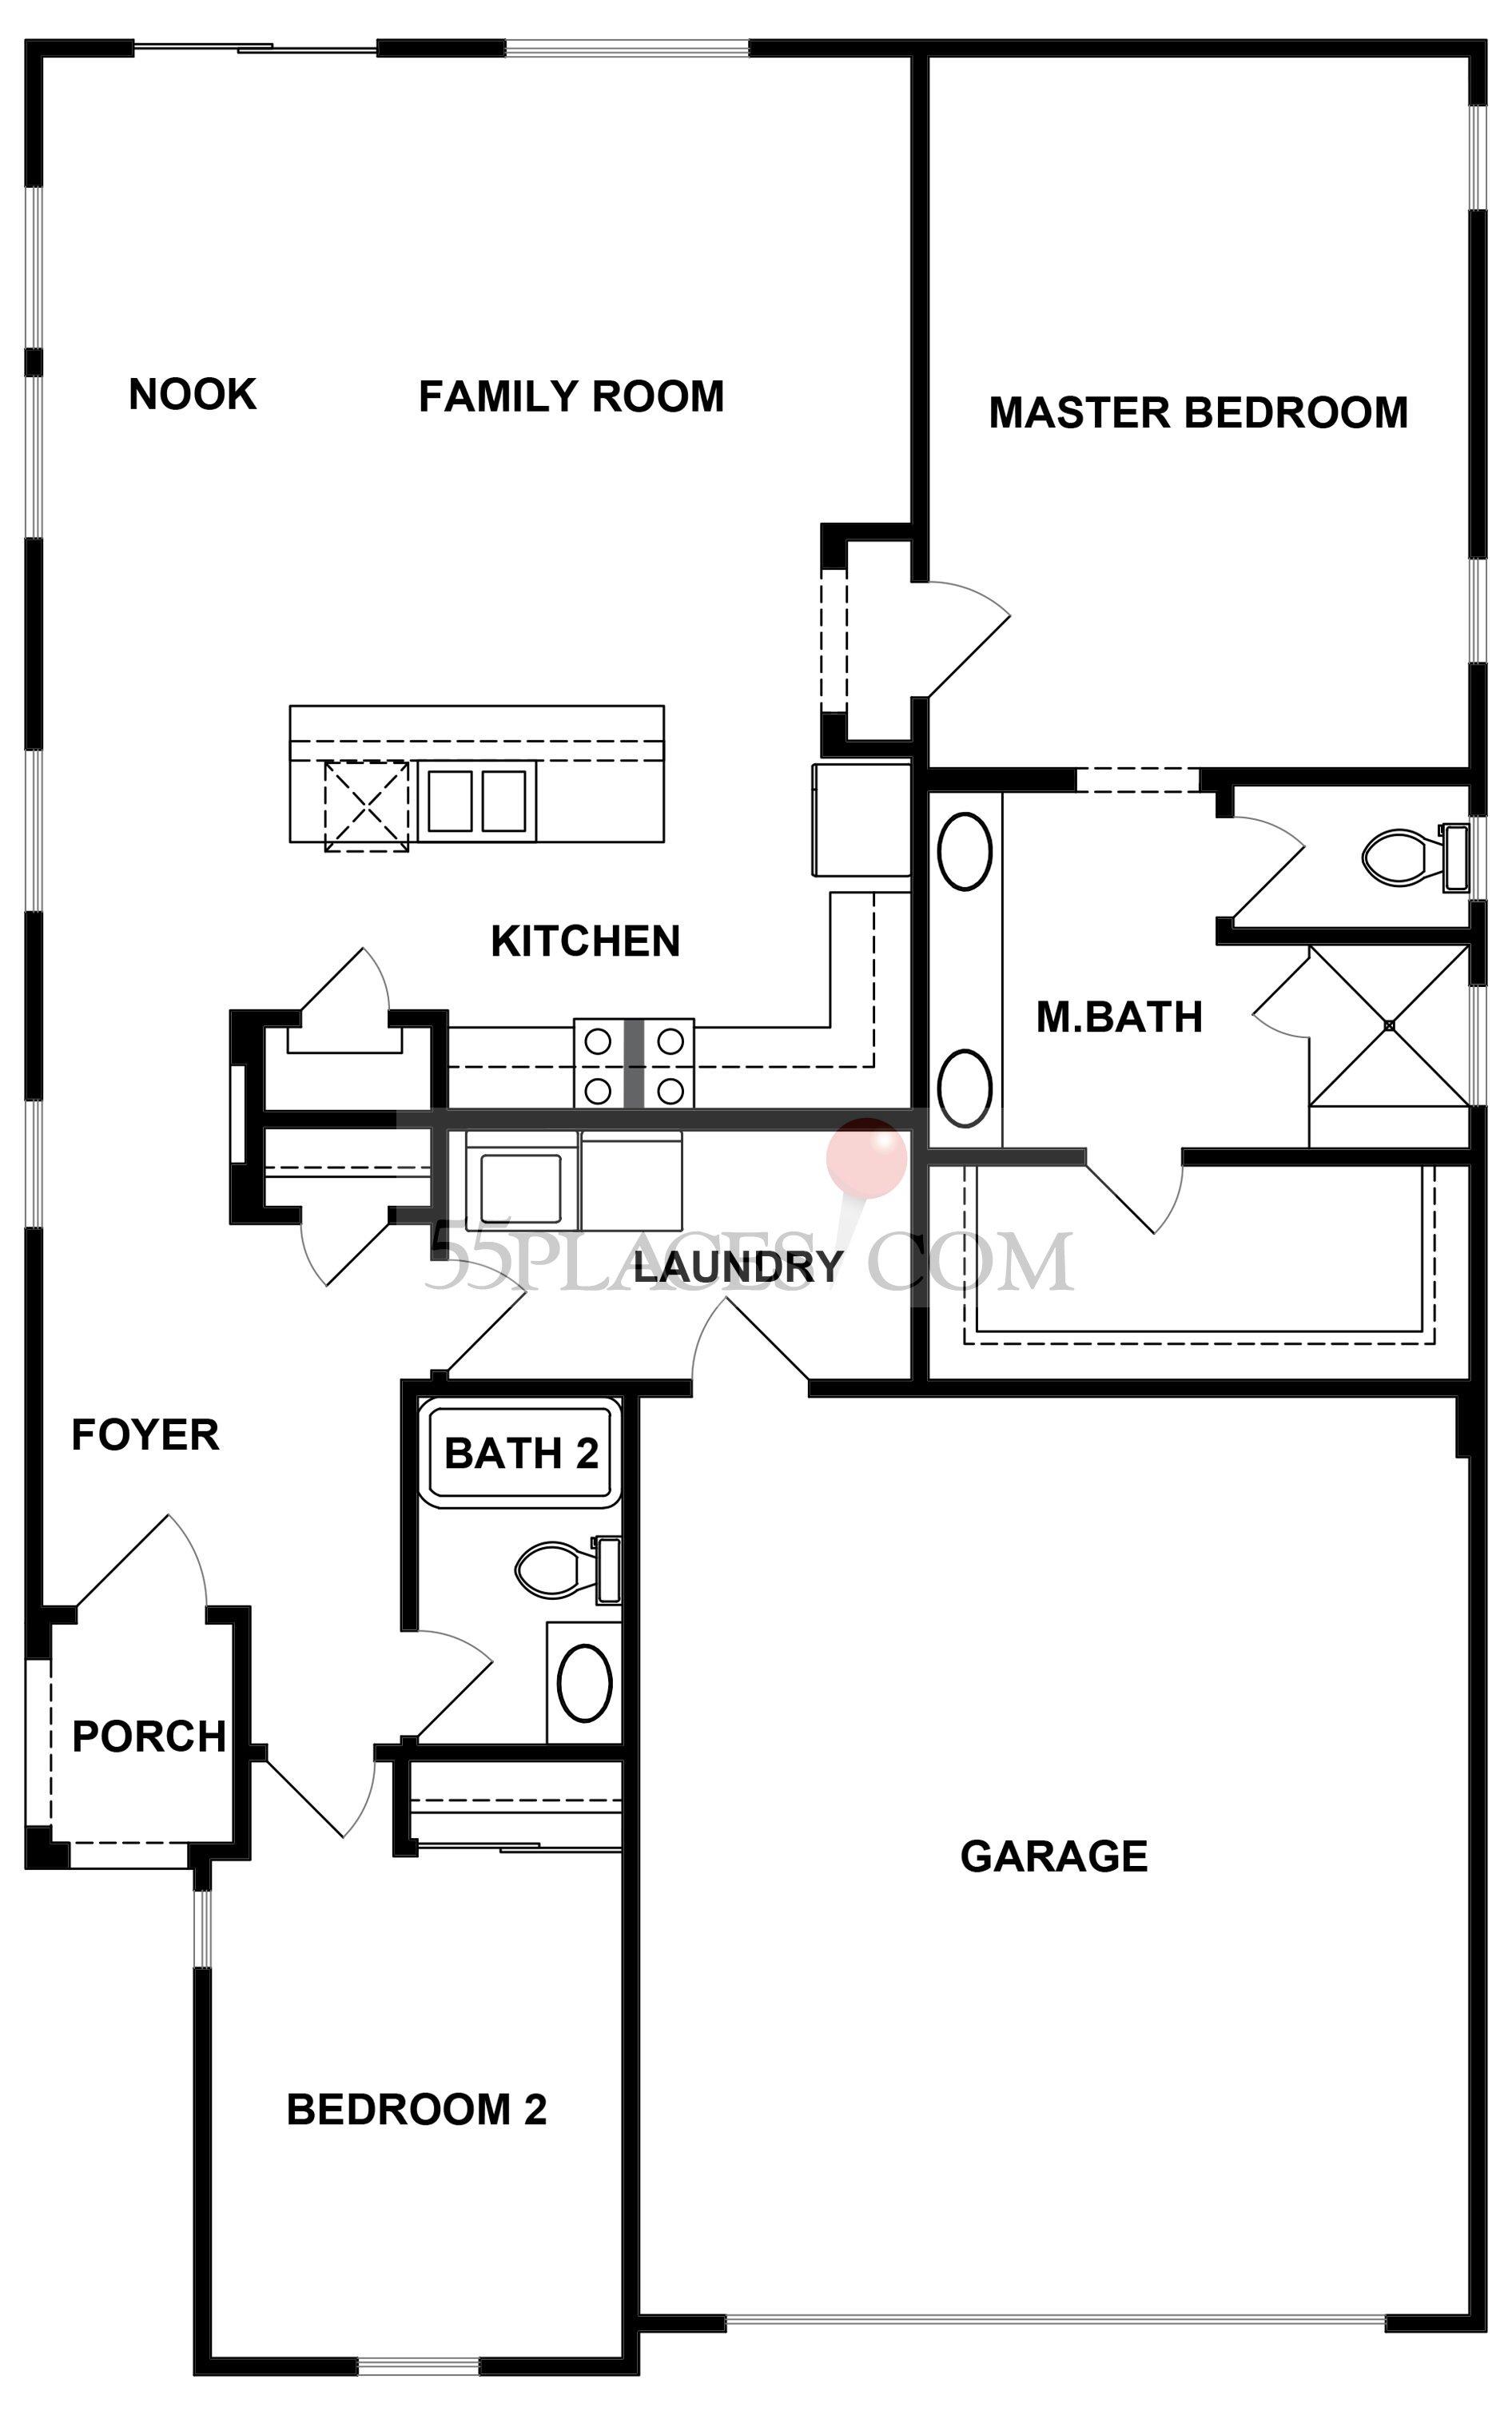 Haven Floorplan 1404 Sq Ft Four Seasons At Beaumont 55places